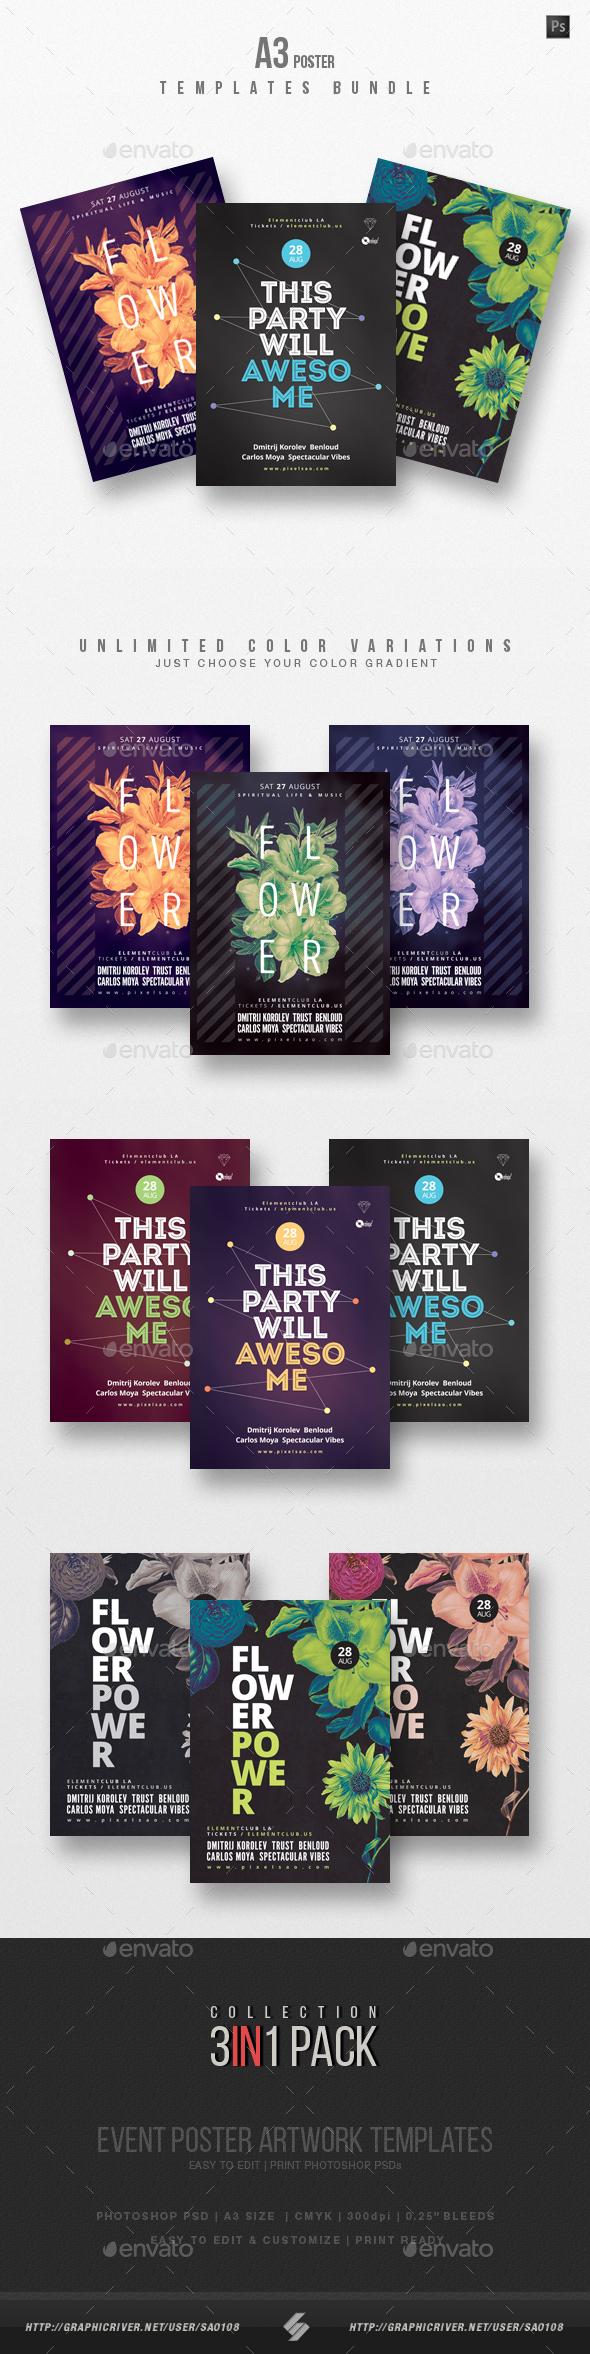 Creative Sound vol7 - Party Flyer Templates Bundle A3 - Events Flyers